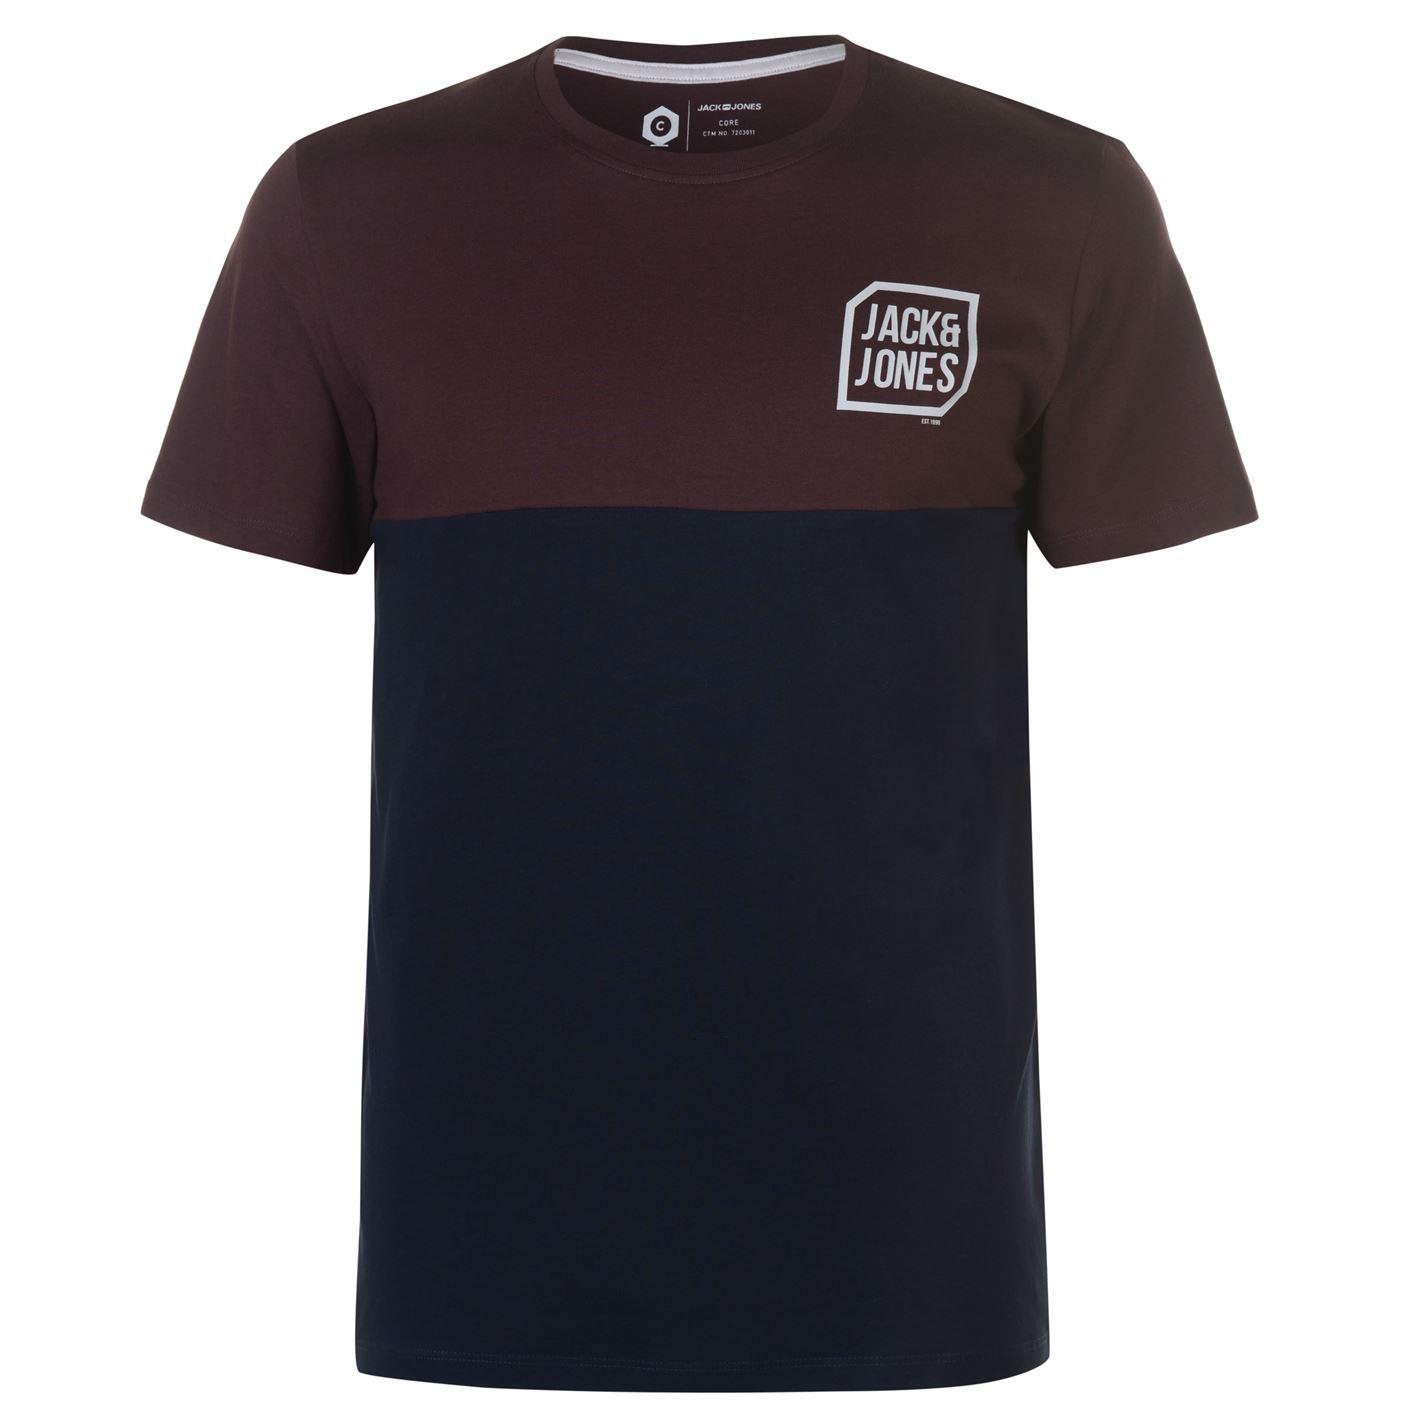 Jack-and-Jones-Core-Tern-T-Shirt-Mens-Tee-Shirt-Top thumbnail 8